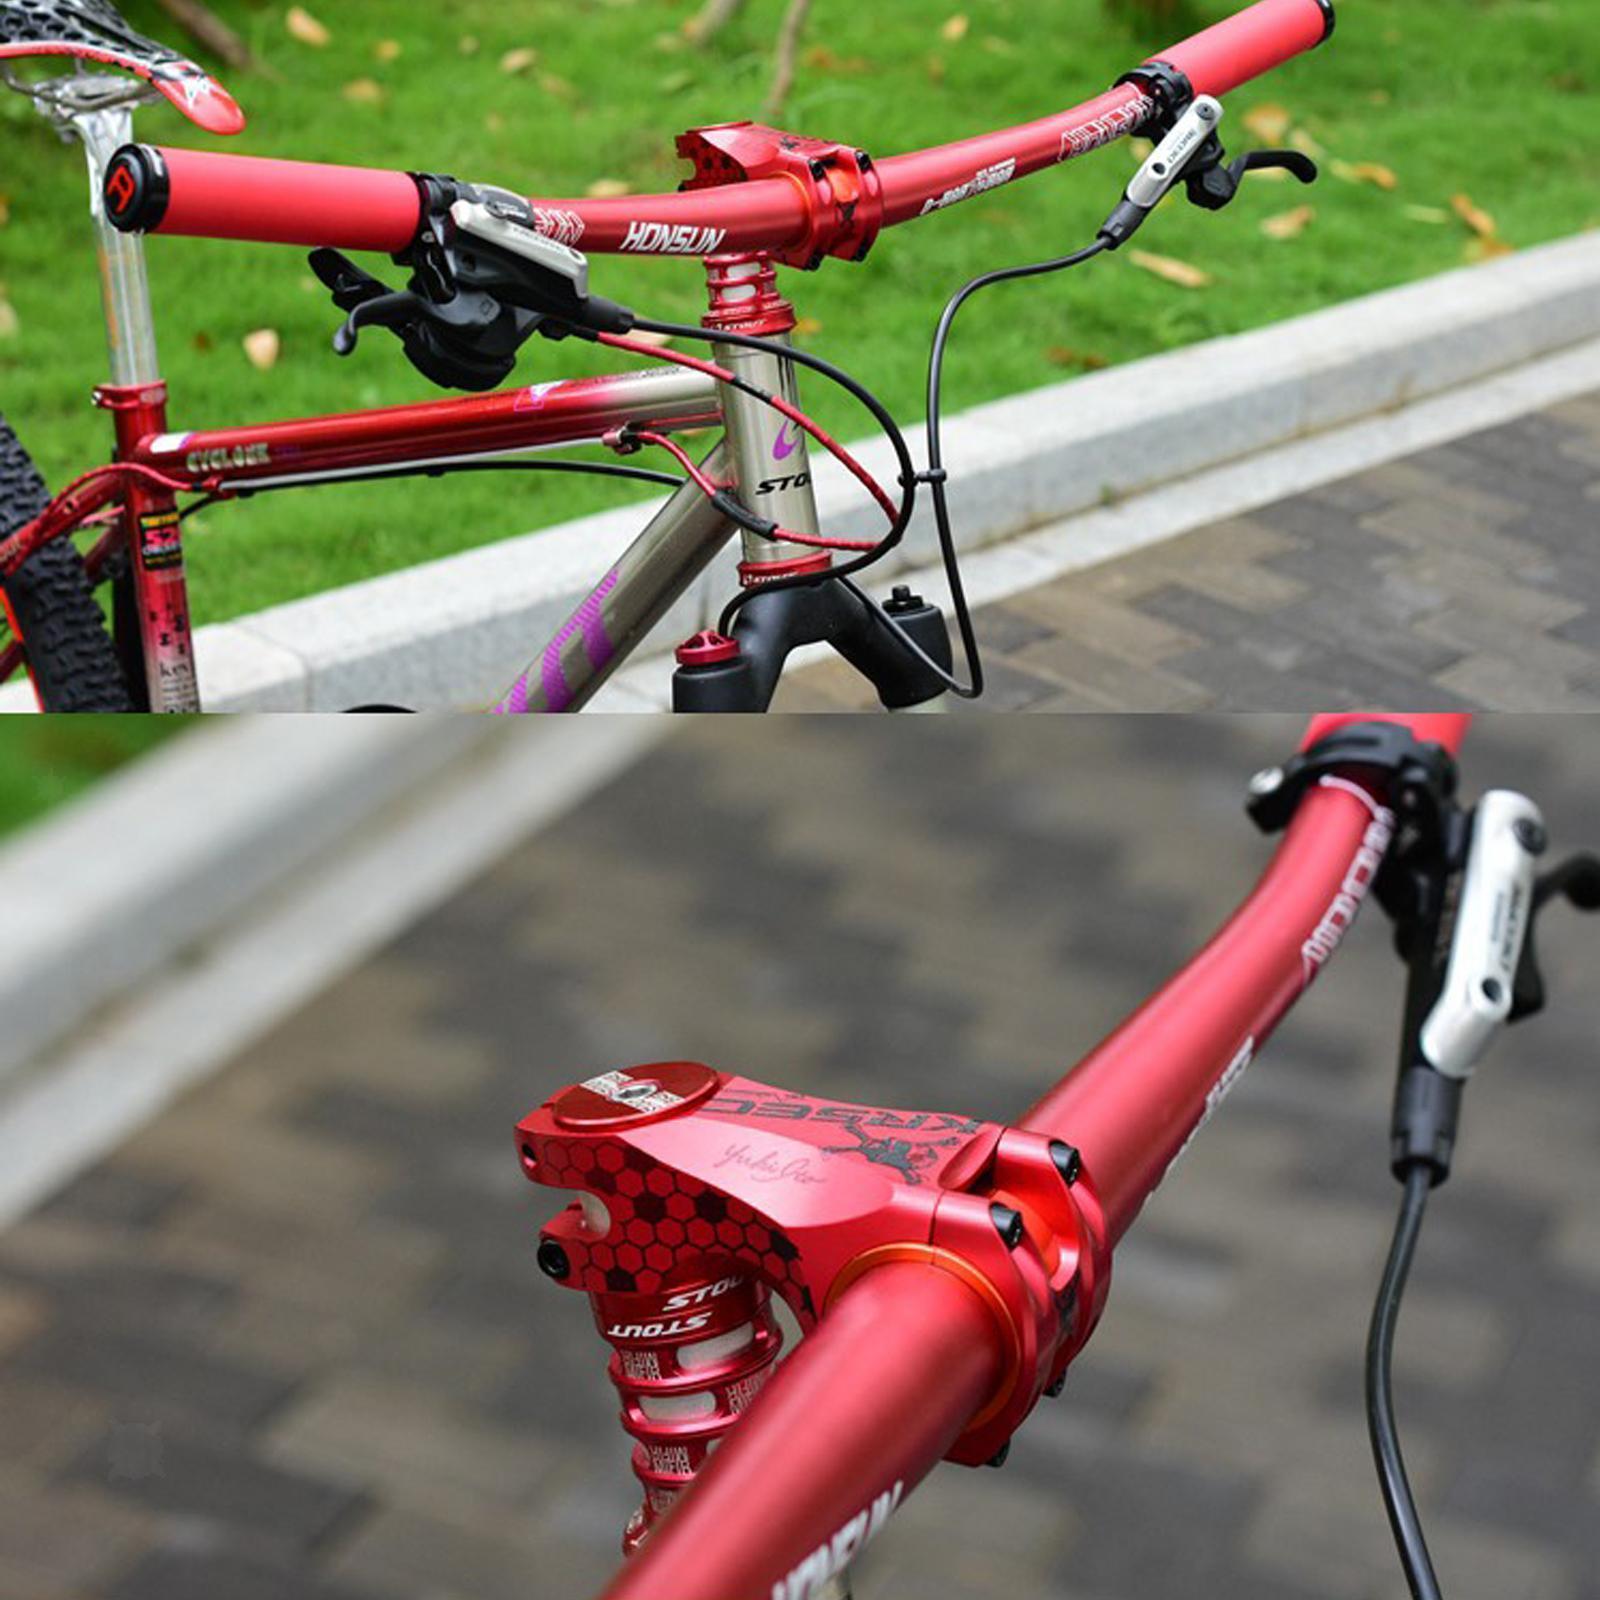 Bike Stem Fixed Gear Cycling Mountain Bike Stem Bar Clamp for 31.8//35mm 70mm